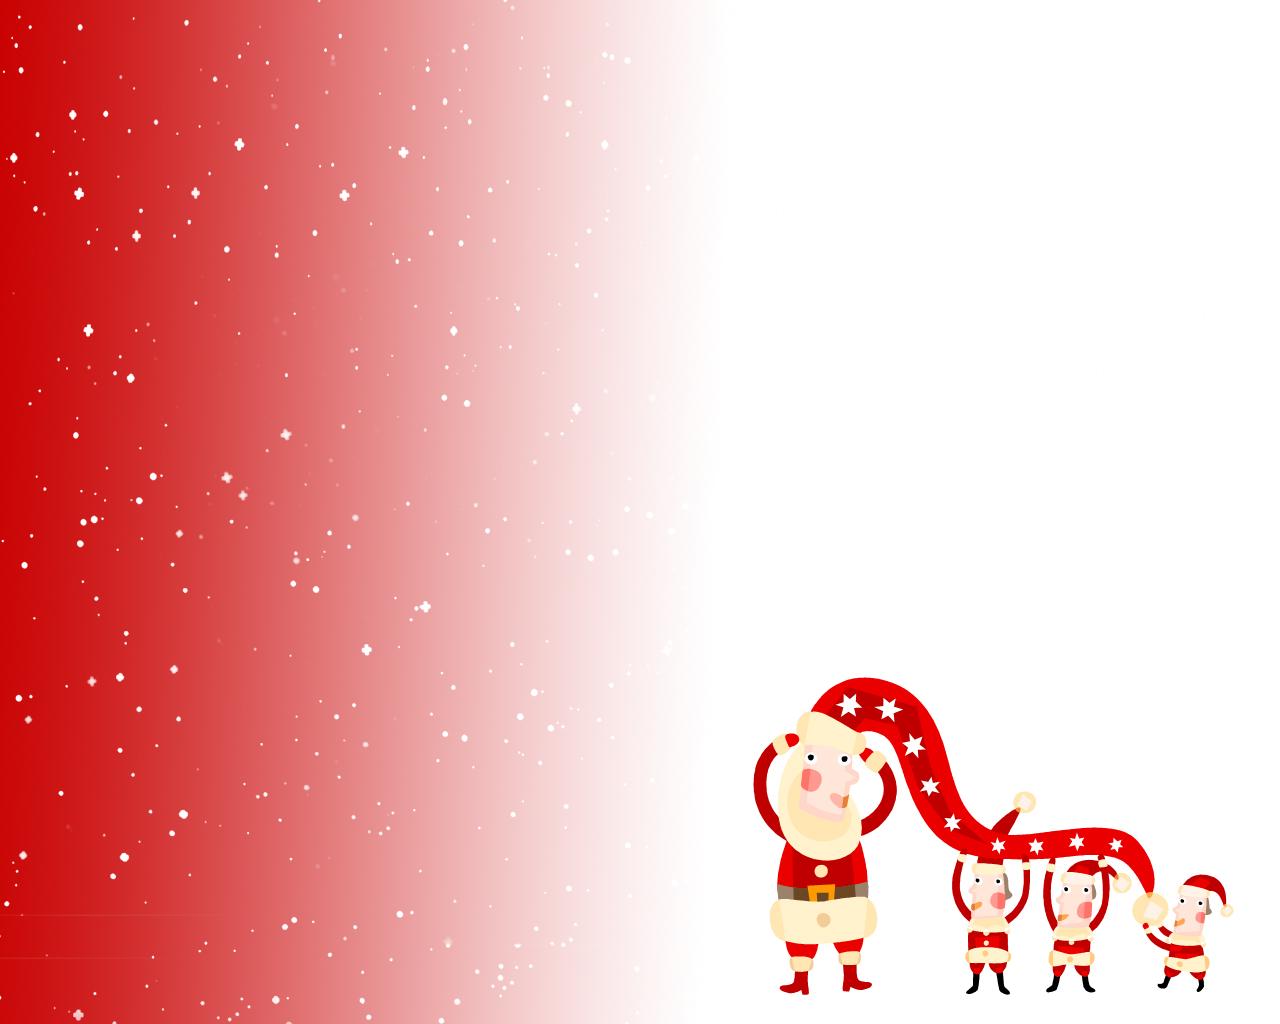 Cute Santa Claus Doll Christmas Wallpaper Imag 11378 1280x1024